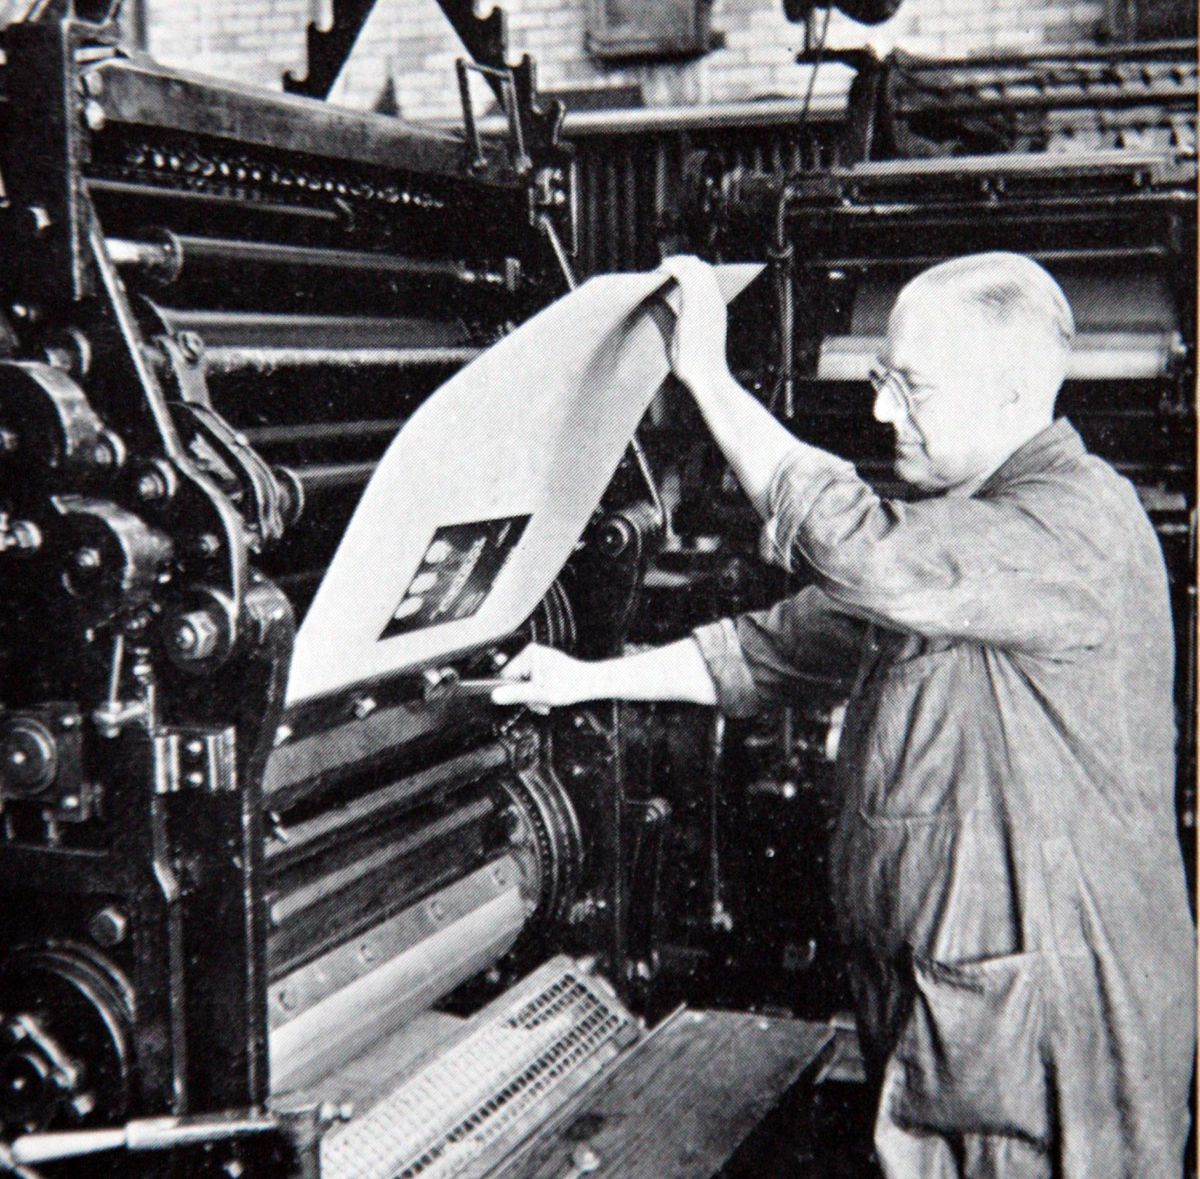 A man works at the printing press